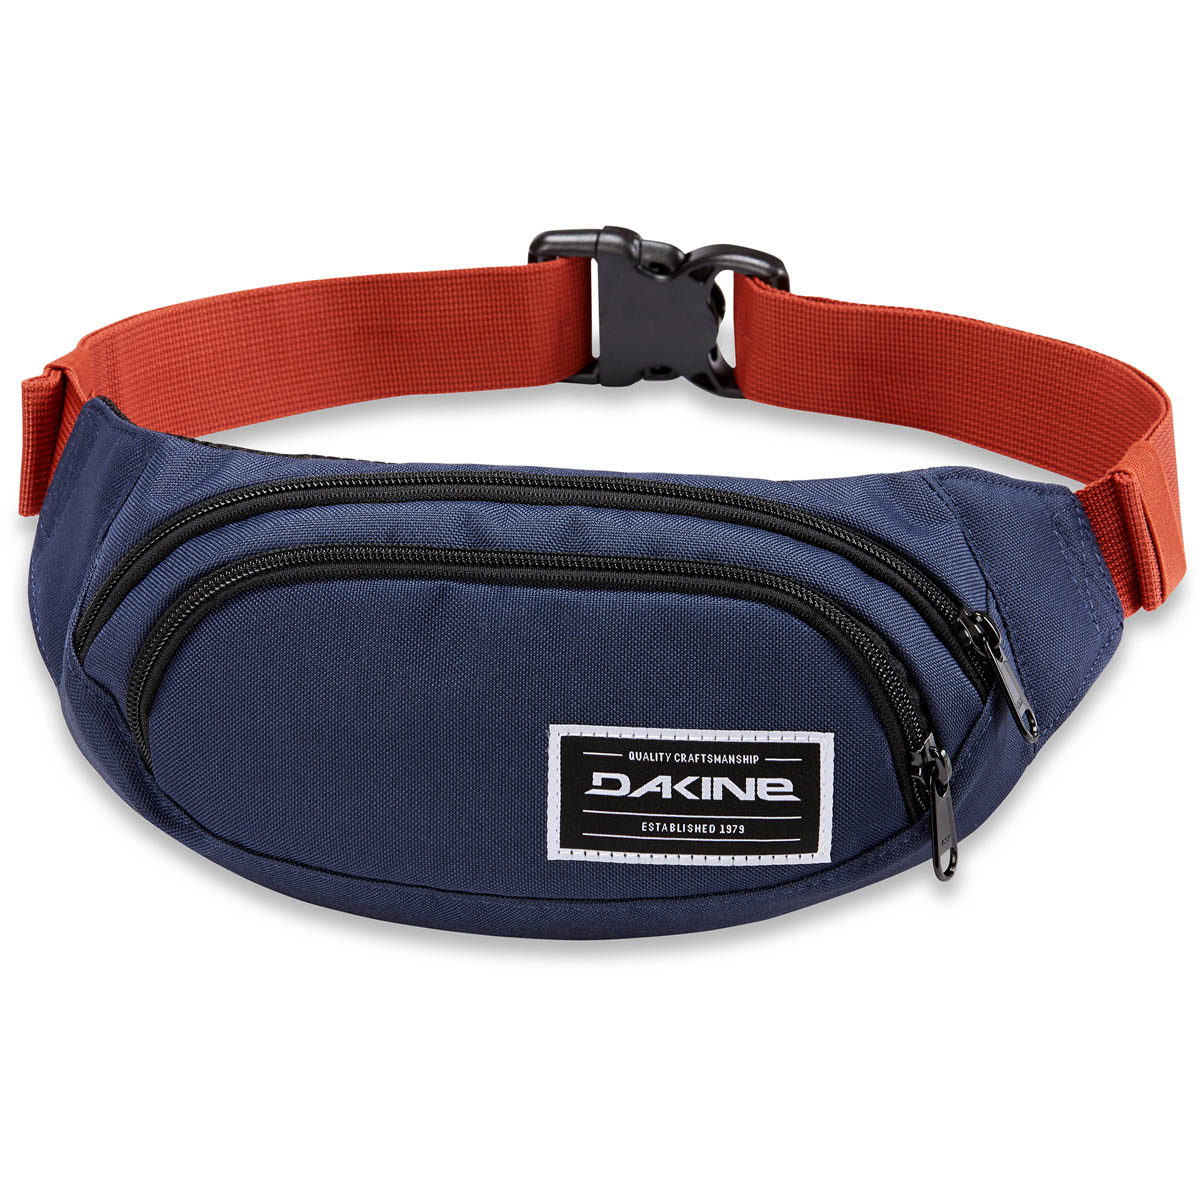 Hüfttasche Hip Bag Bauchtasche